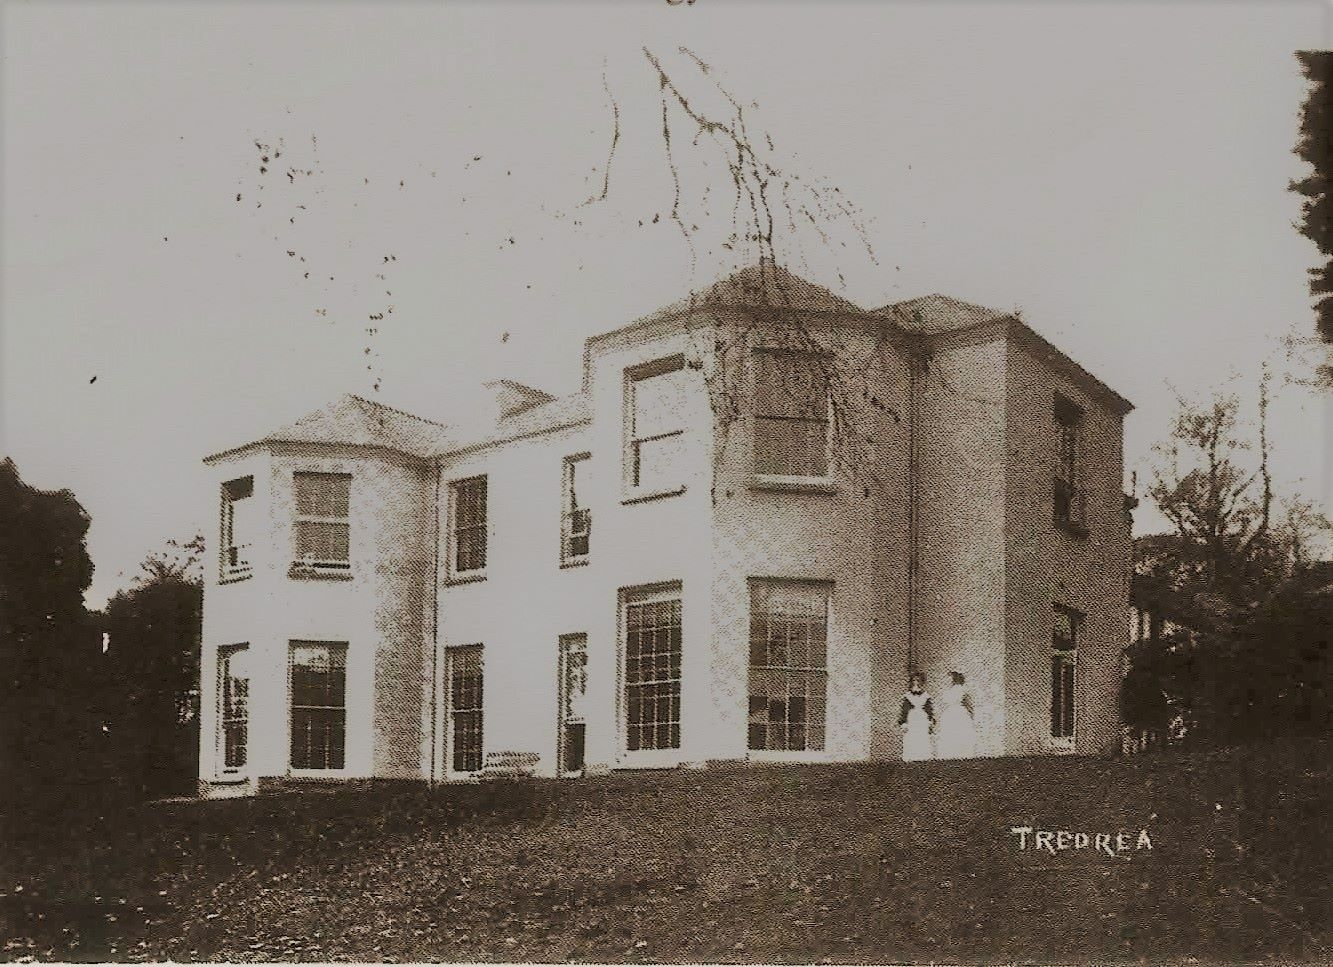 Tredrea House